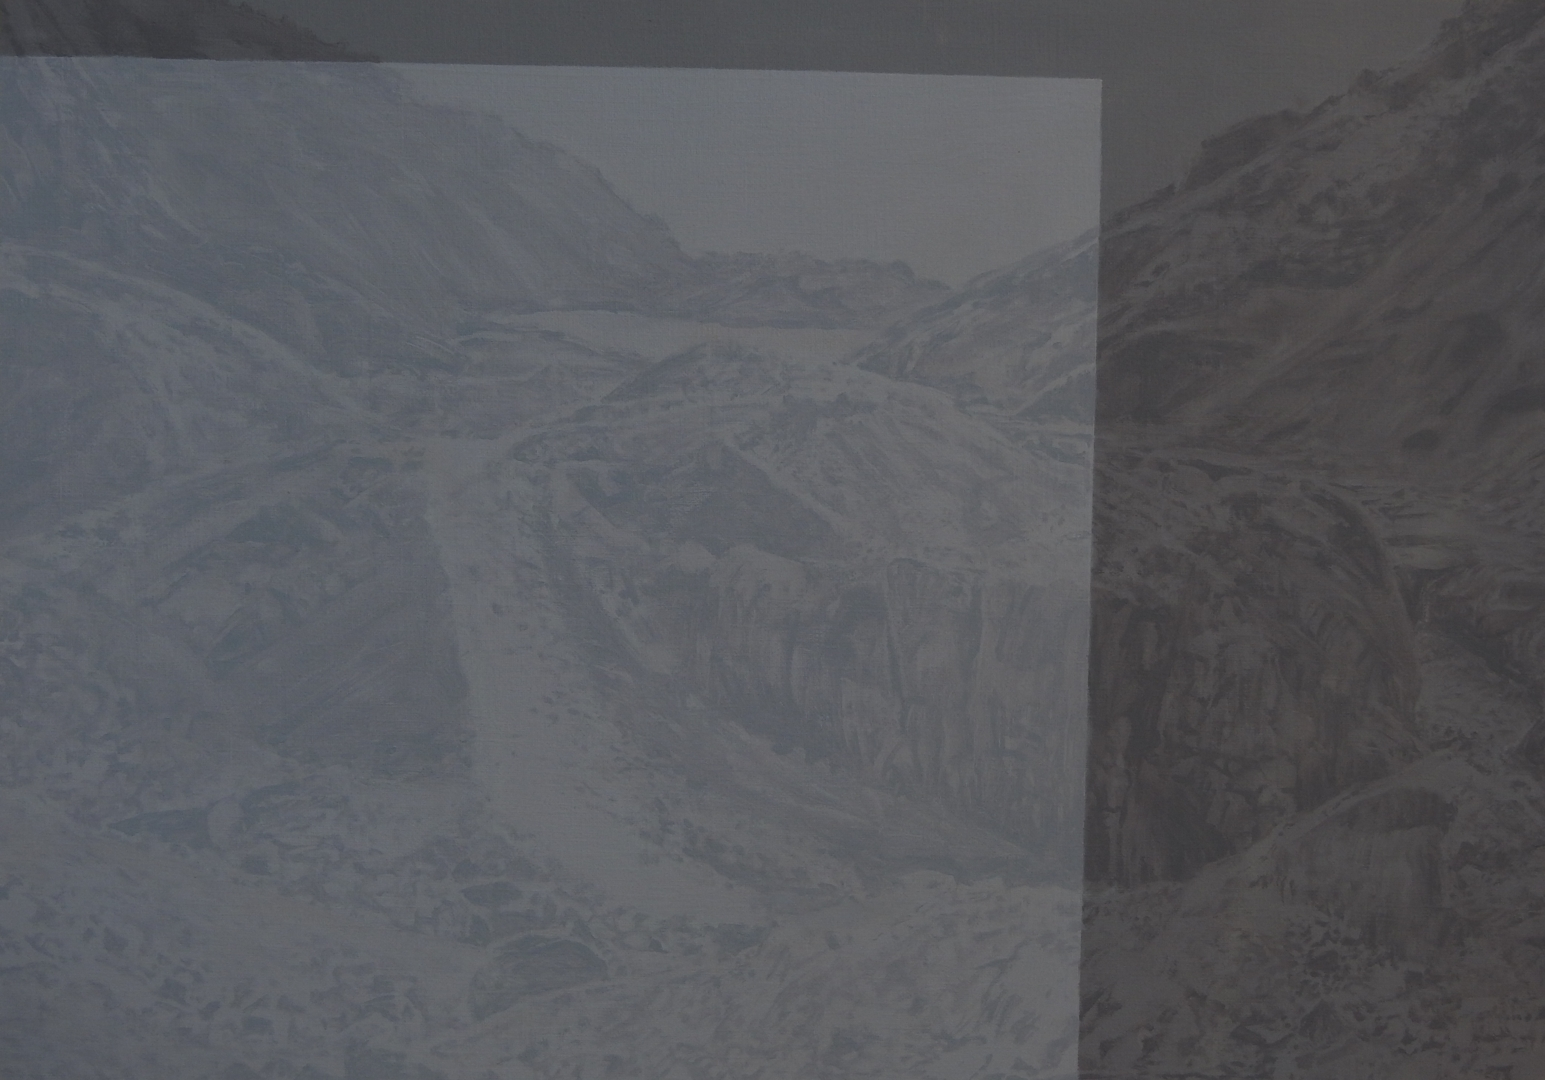 Thalia Robertson, Landscape Study 2, oil on paper image